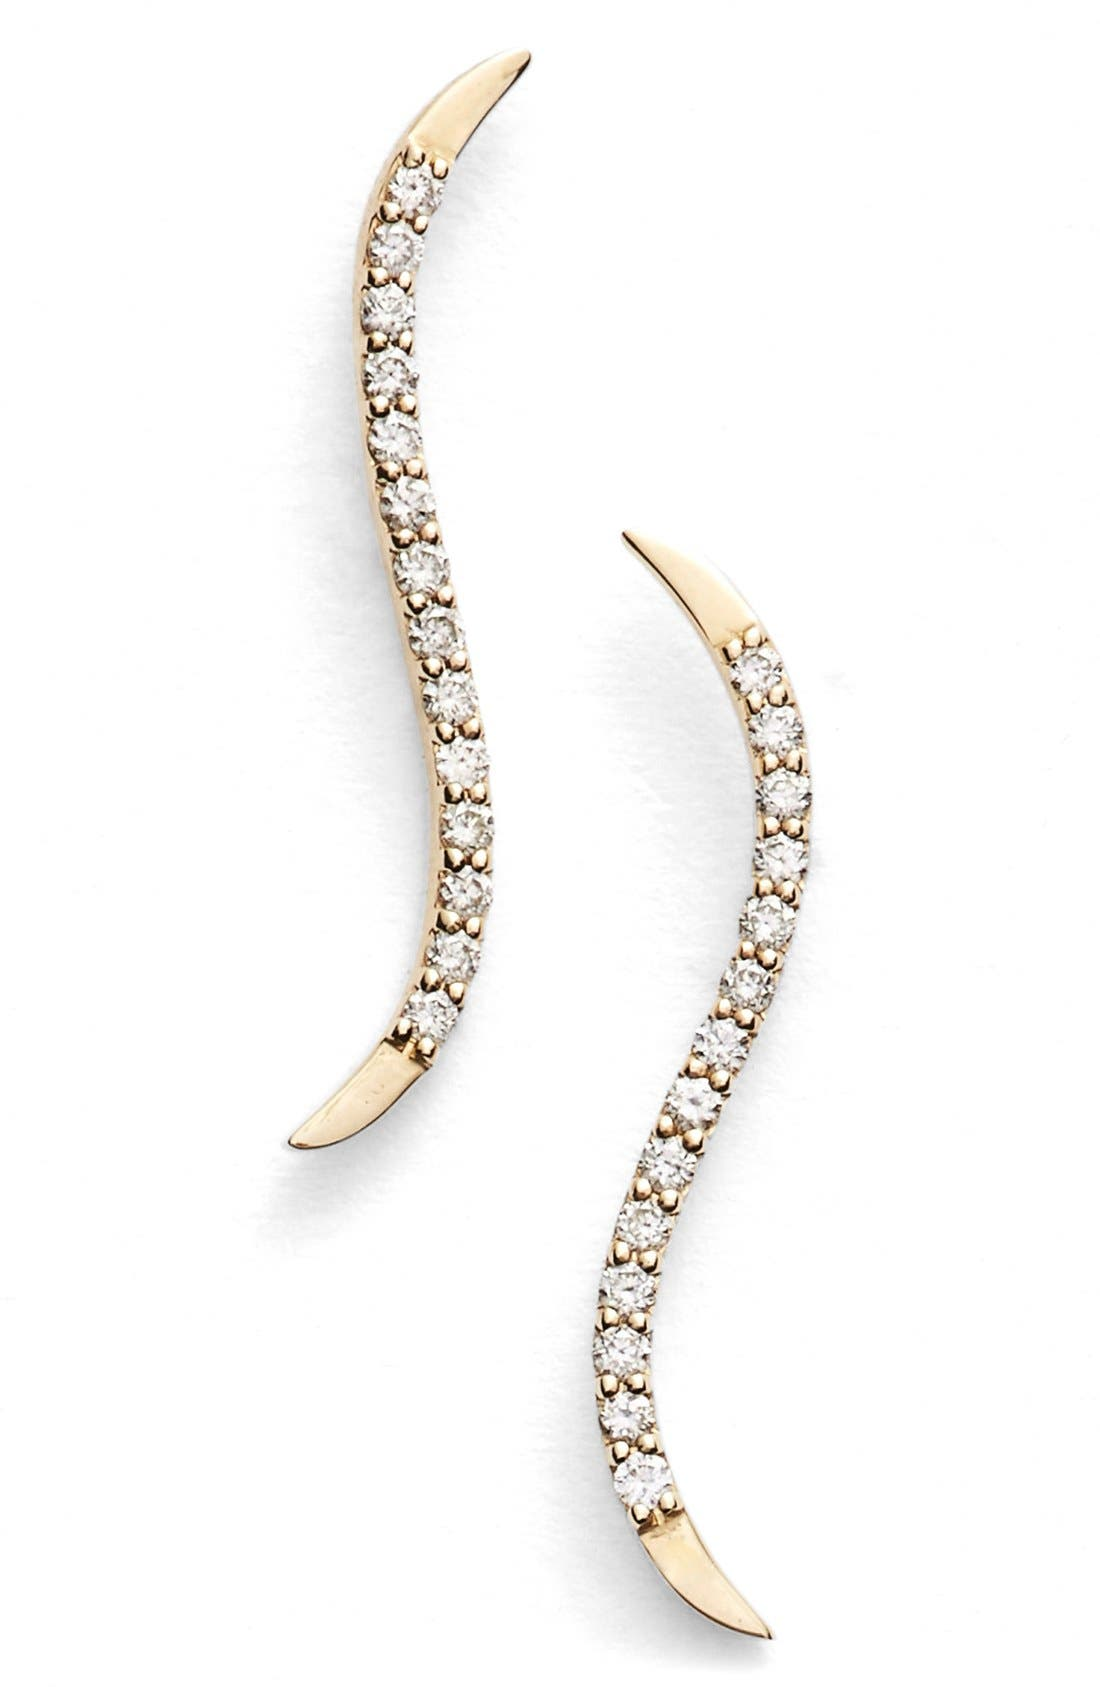 Alternate Image 1 Selected - Lana Jewelry 'Mirage' Diamond Stud Earrings